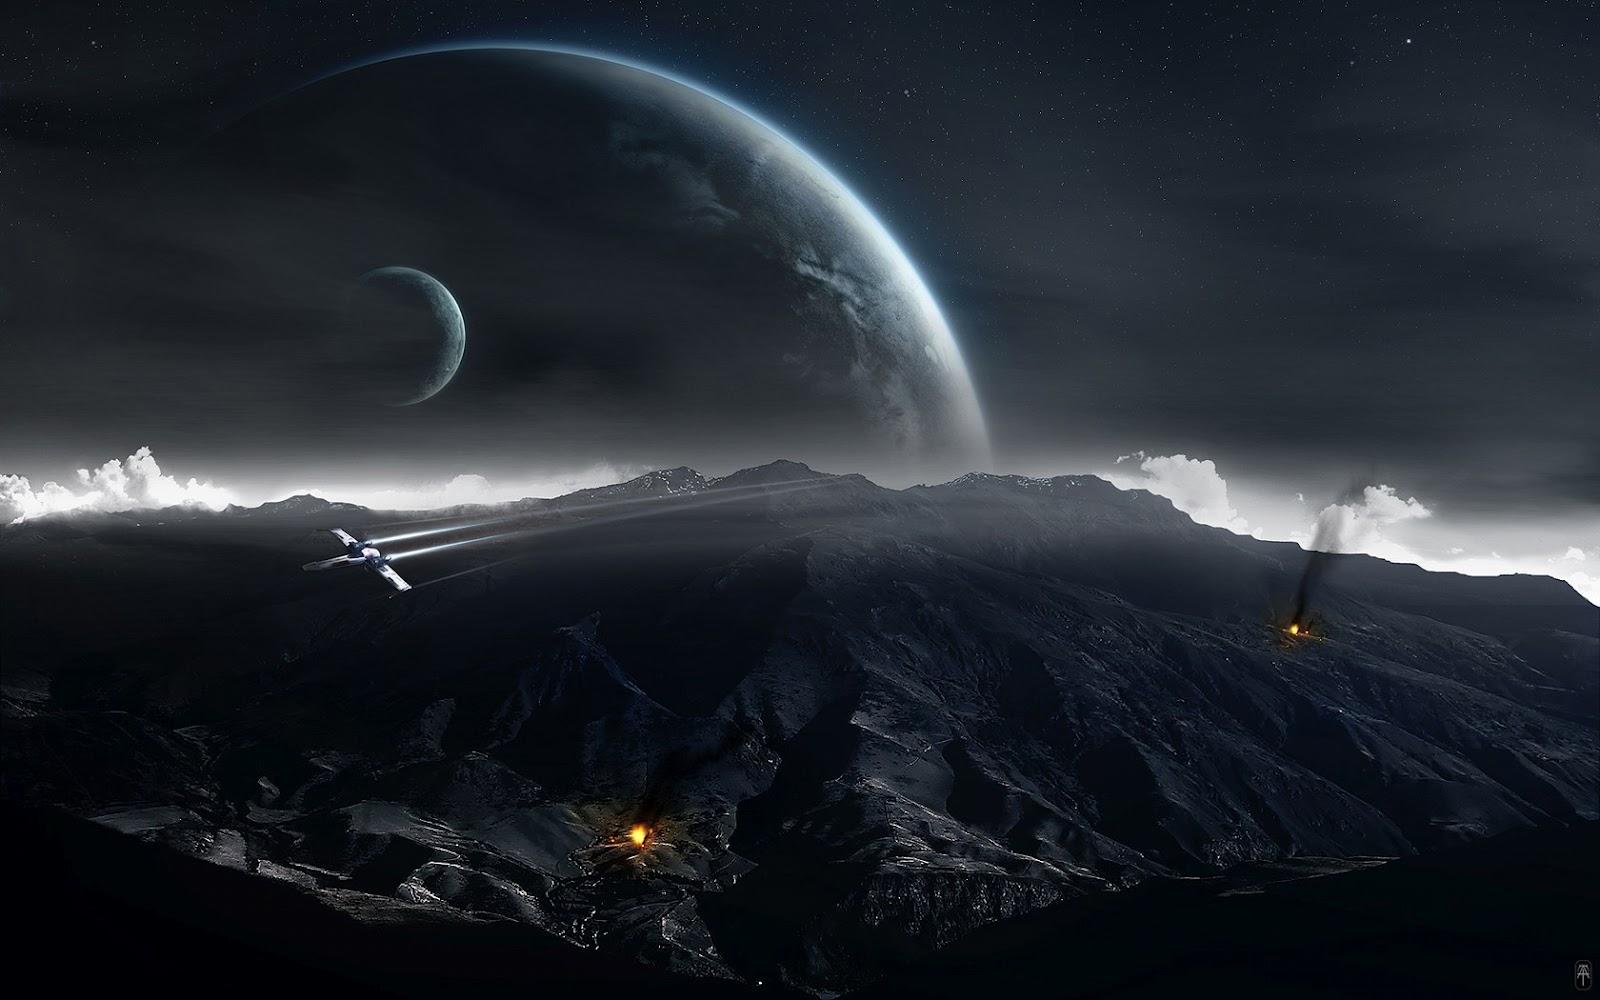 http://2.bp.blogspot.com/-r_WIaNVNpsE/T9ia6IwgTfI/AAAAAAAAAC8/bo79_zdsm8c/s1600/Universe_and_planets_digital_art_wallpaper_dk.jpg